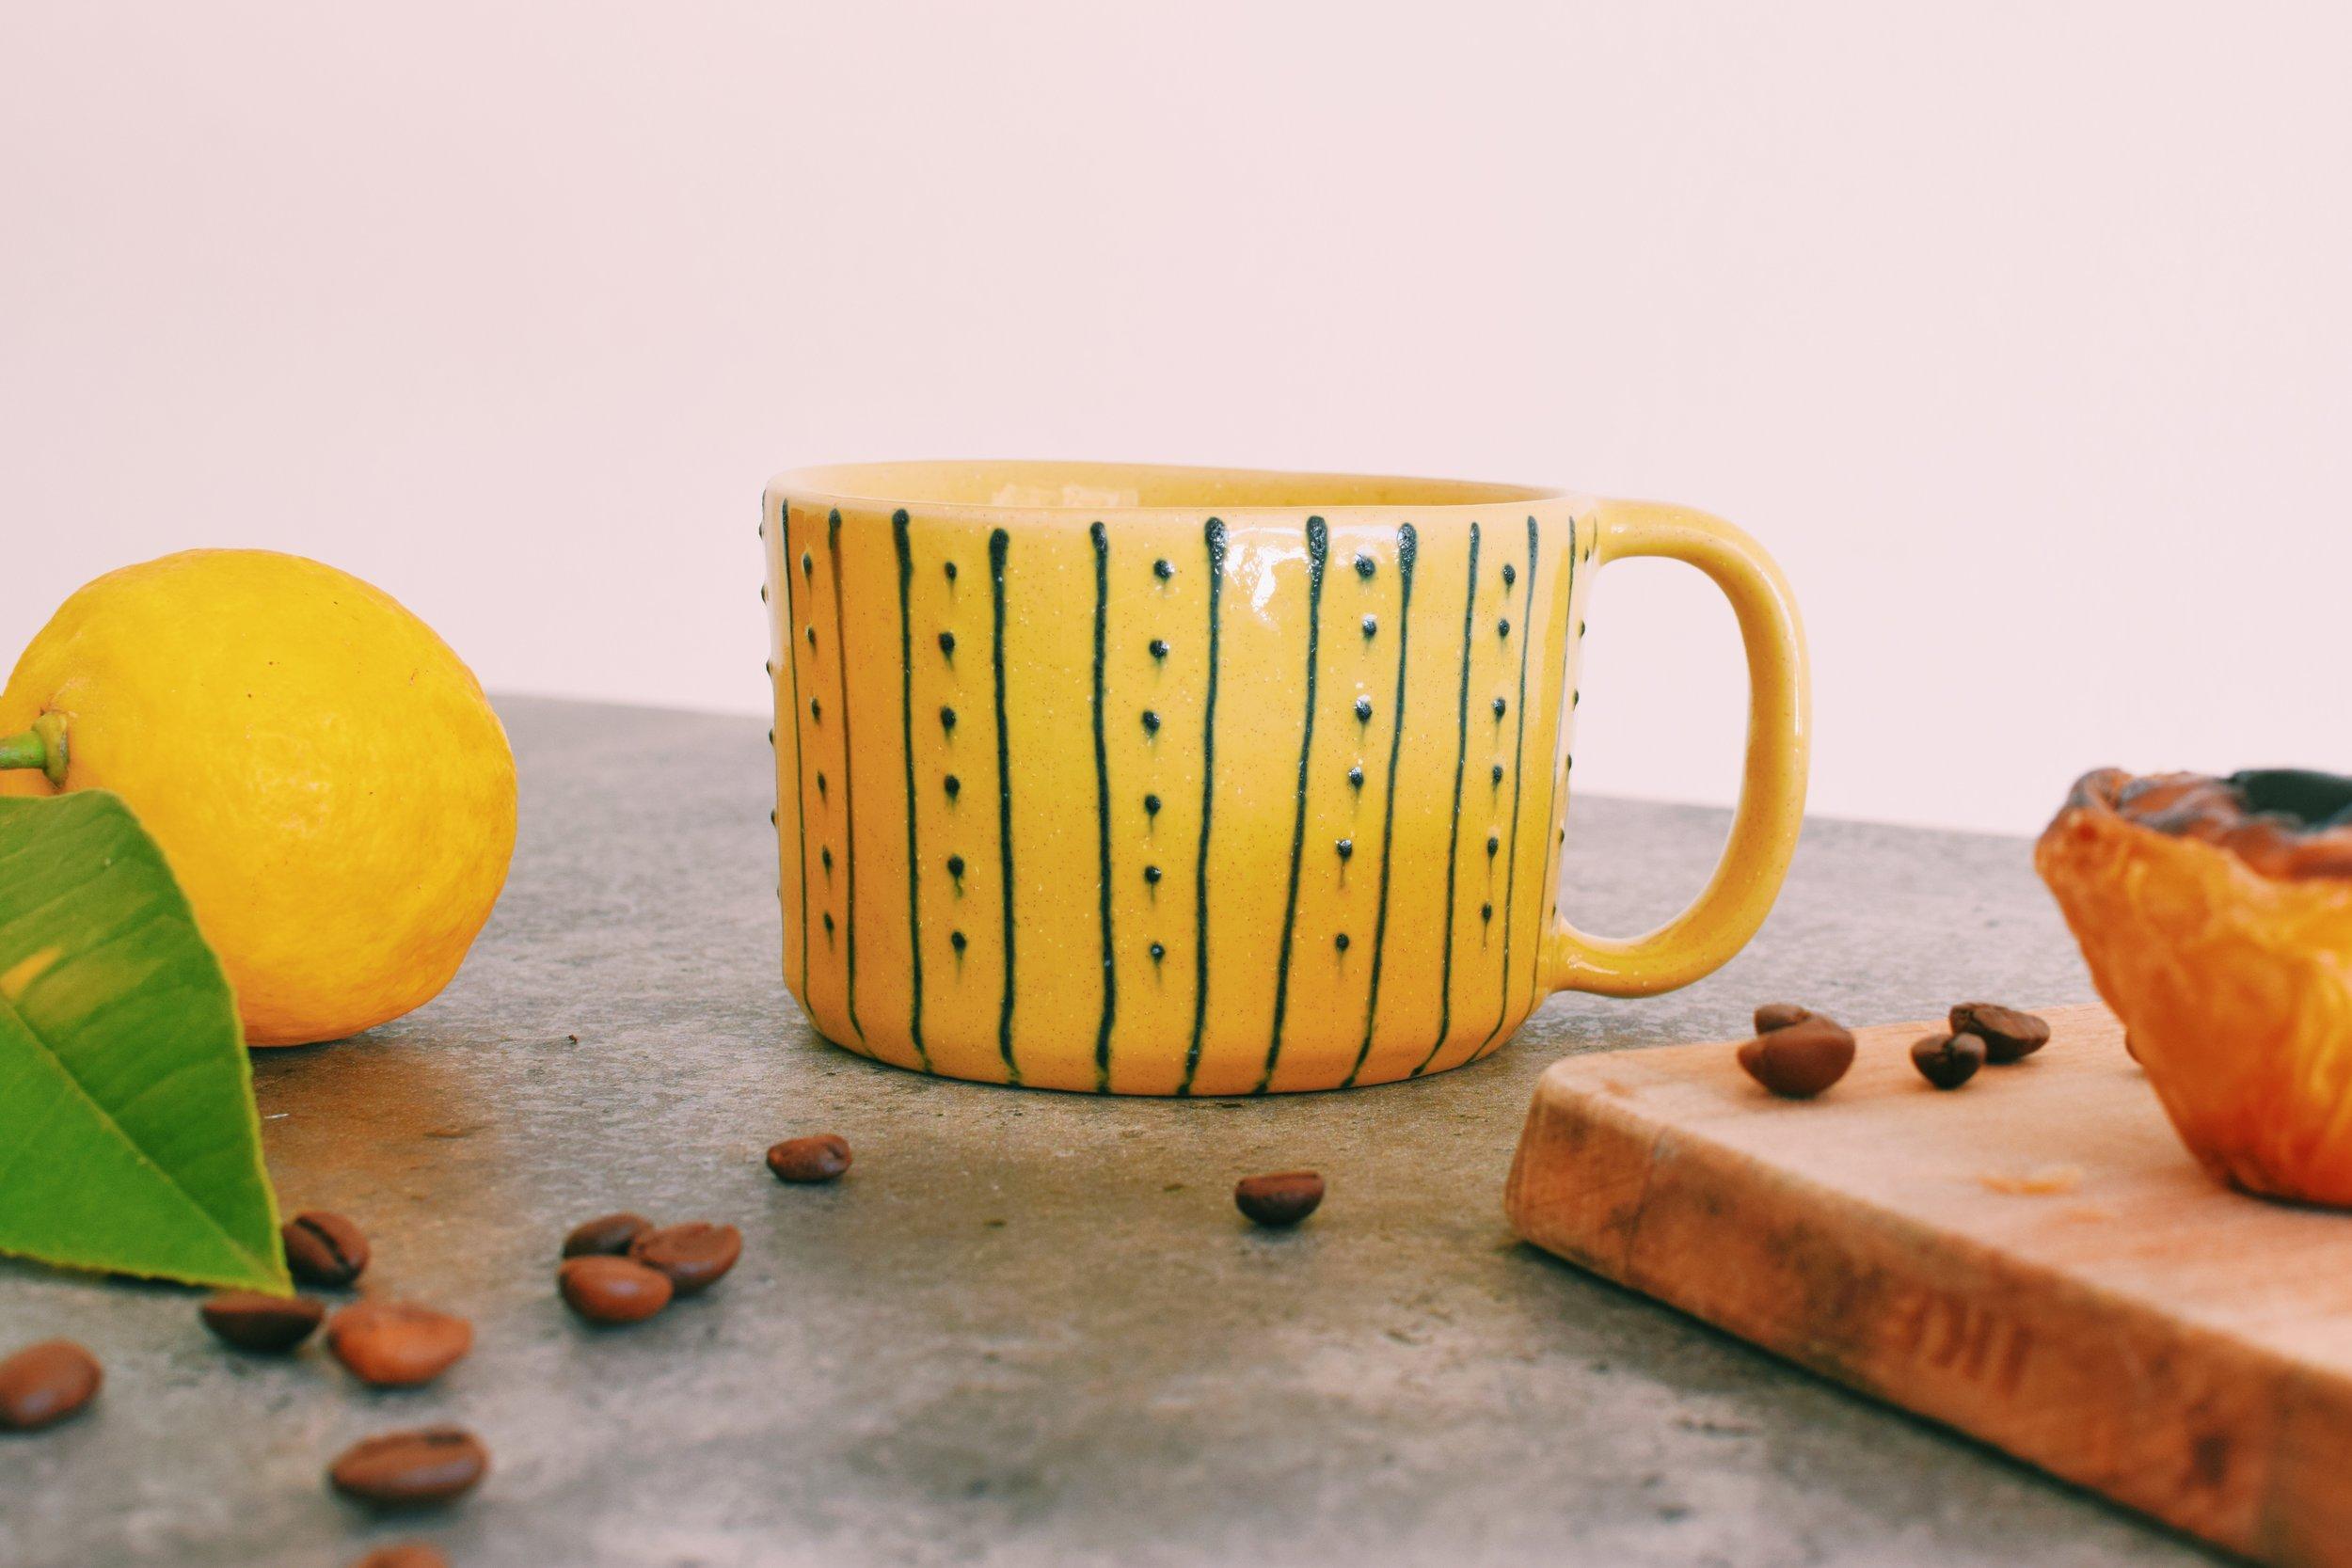 Kiania Ceramic Mug handmade in Portugal | Soi 55 Home